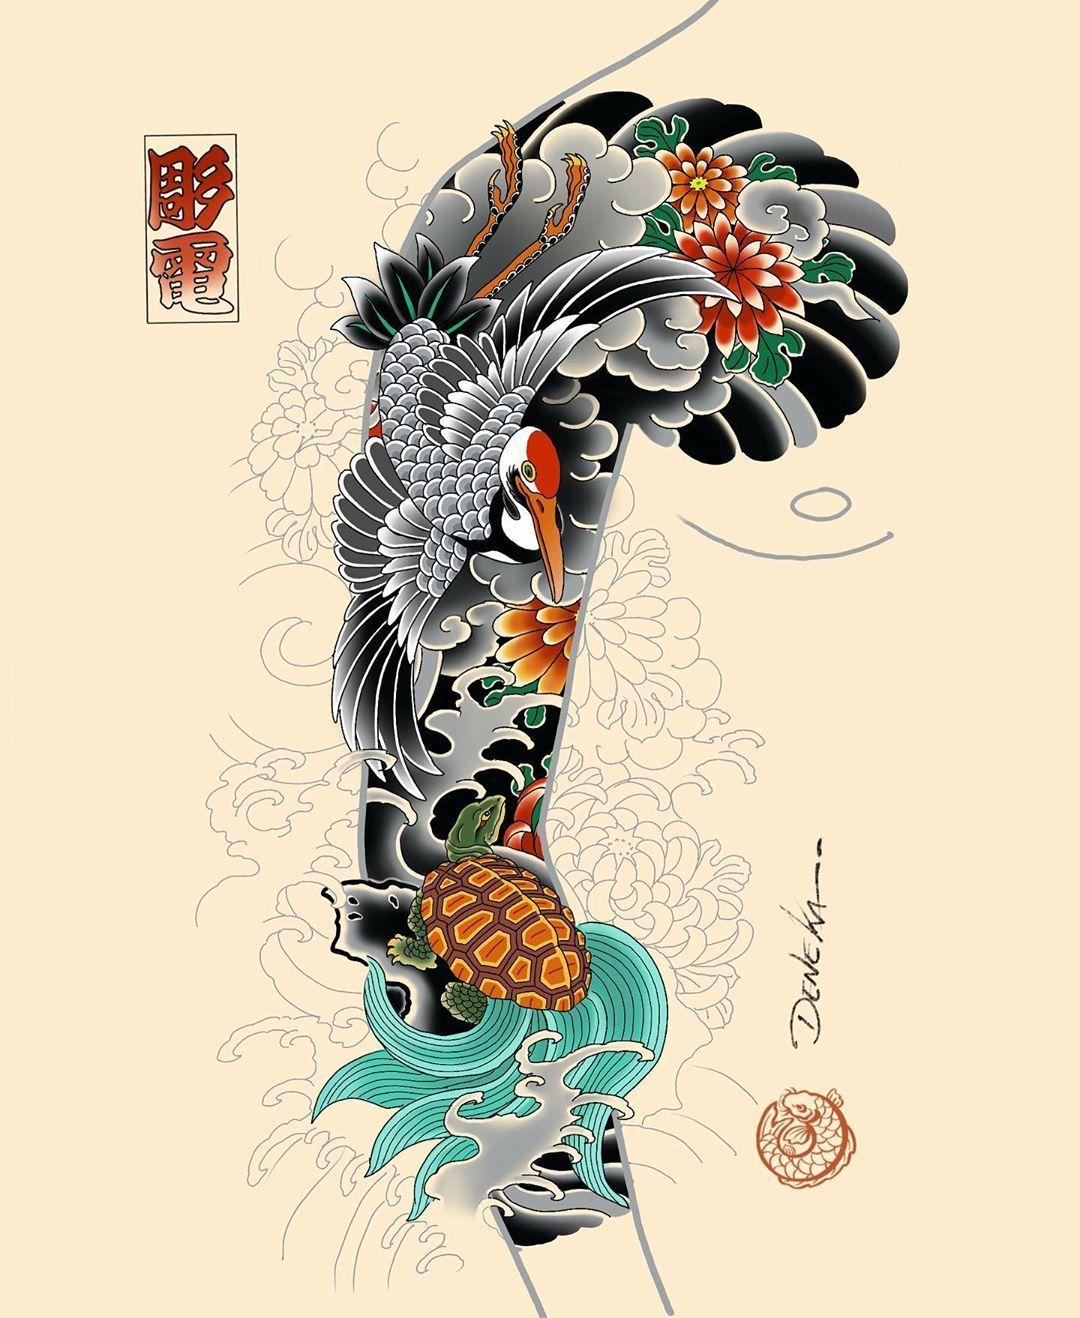 Turtle And Crane Sleeve Idea Available For Bookings Denekahoriden Gmail Com Crane Tsu Koi Tattoo Sleeve Japan Tattoo Design Tattoo Japanese Style